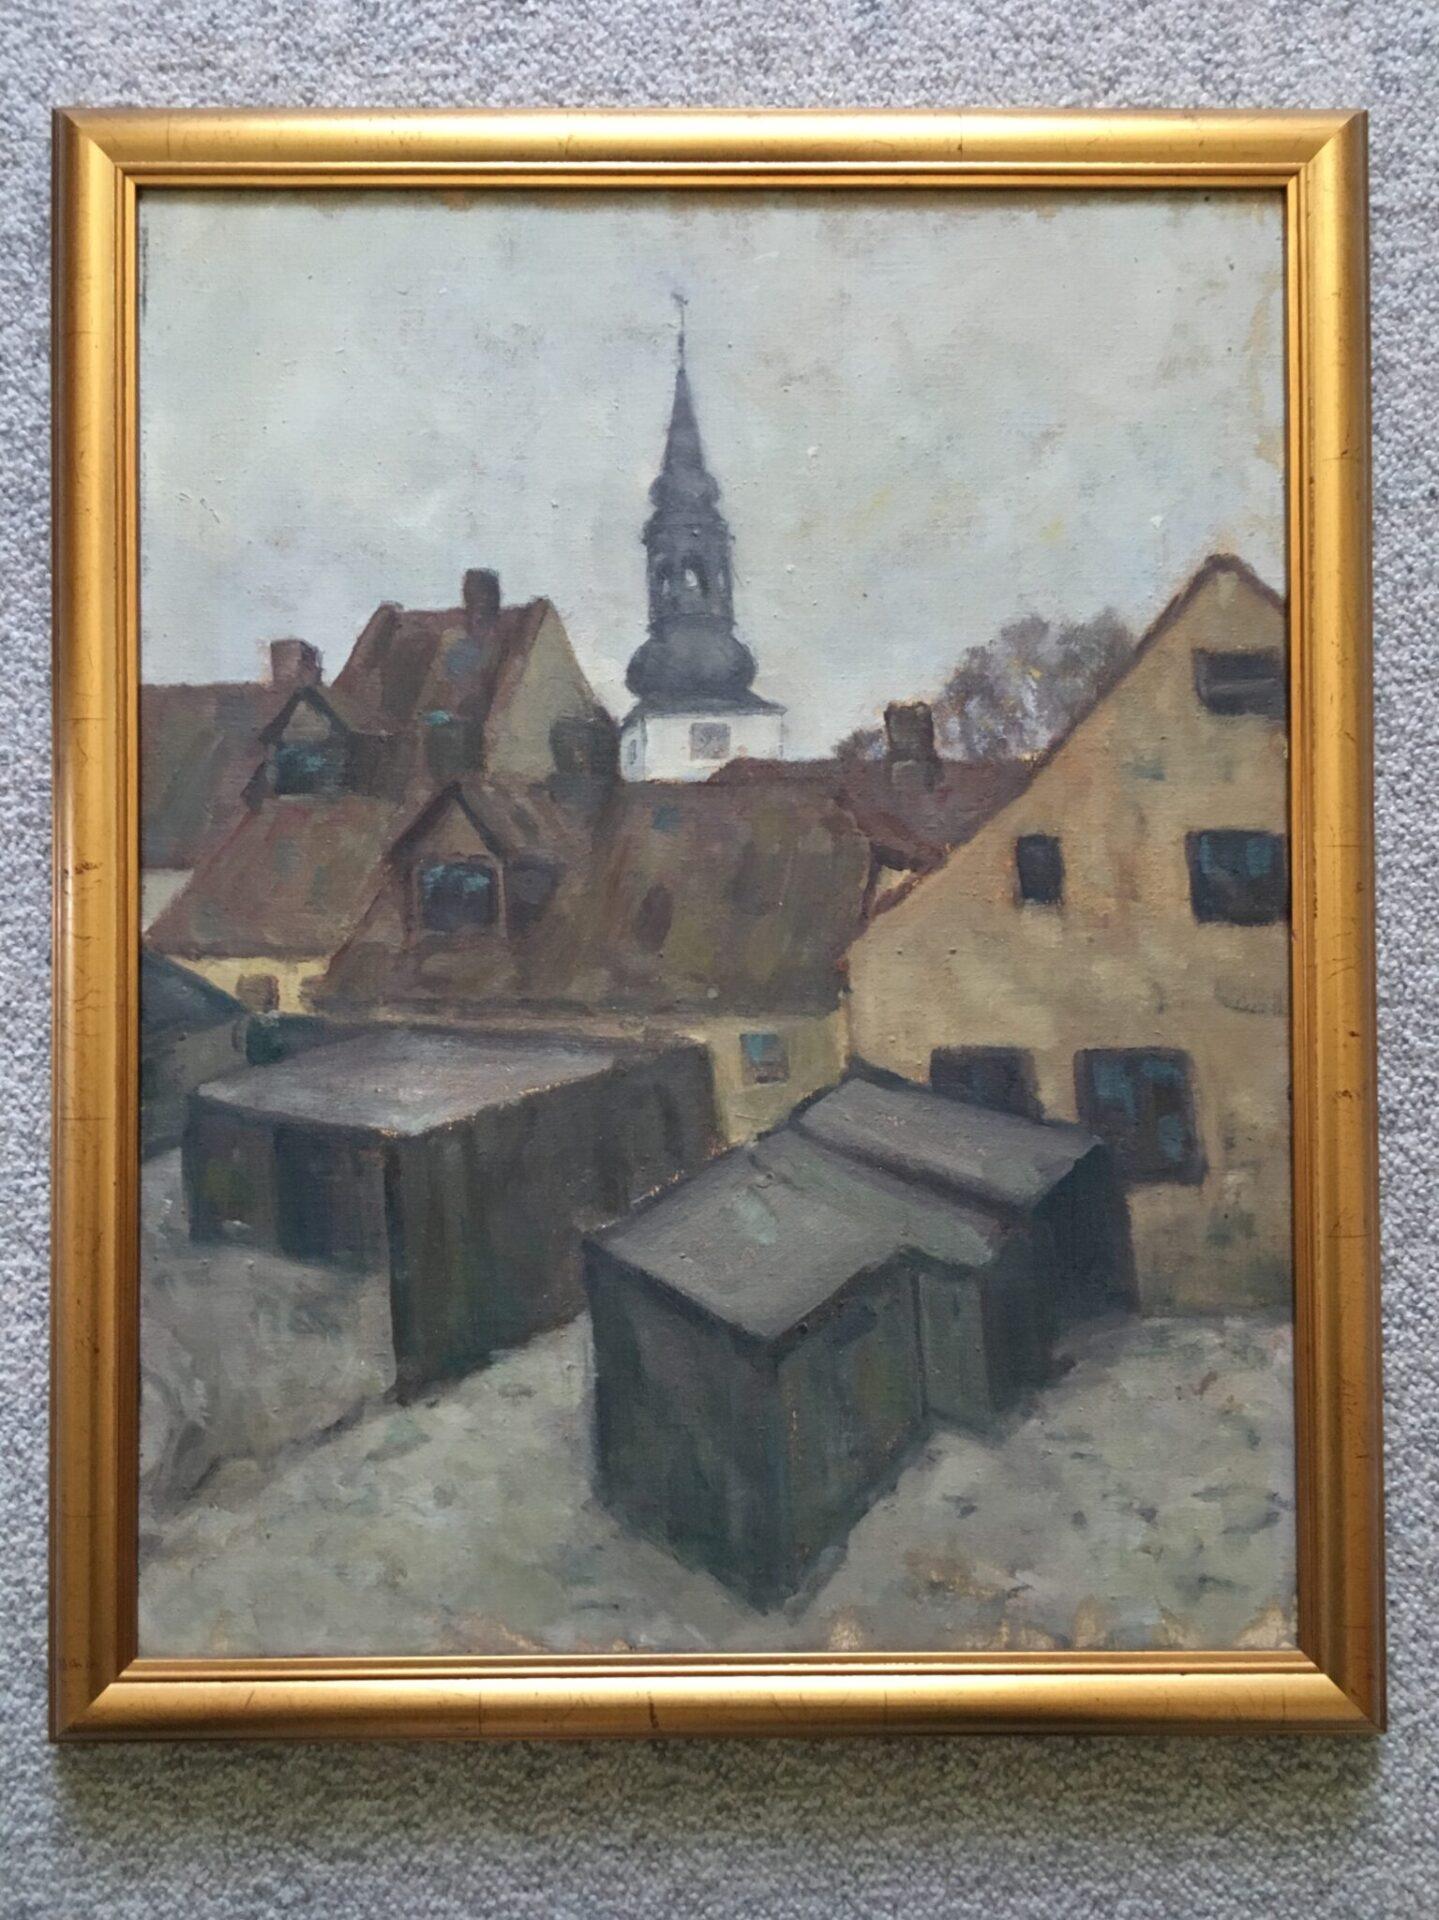 Det gamle Skolekvarter i Aalborg med Budolfi Kirke i baggrunden,